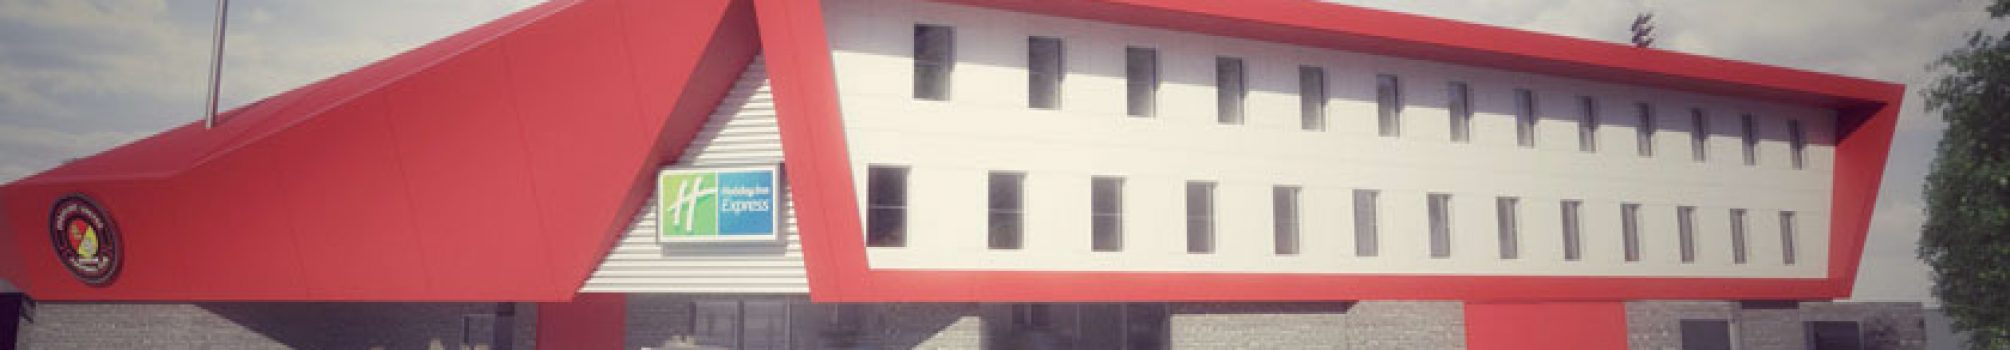 plough-end-hotel